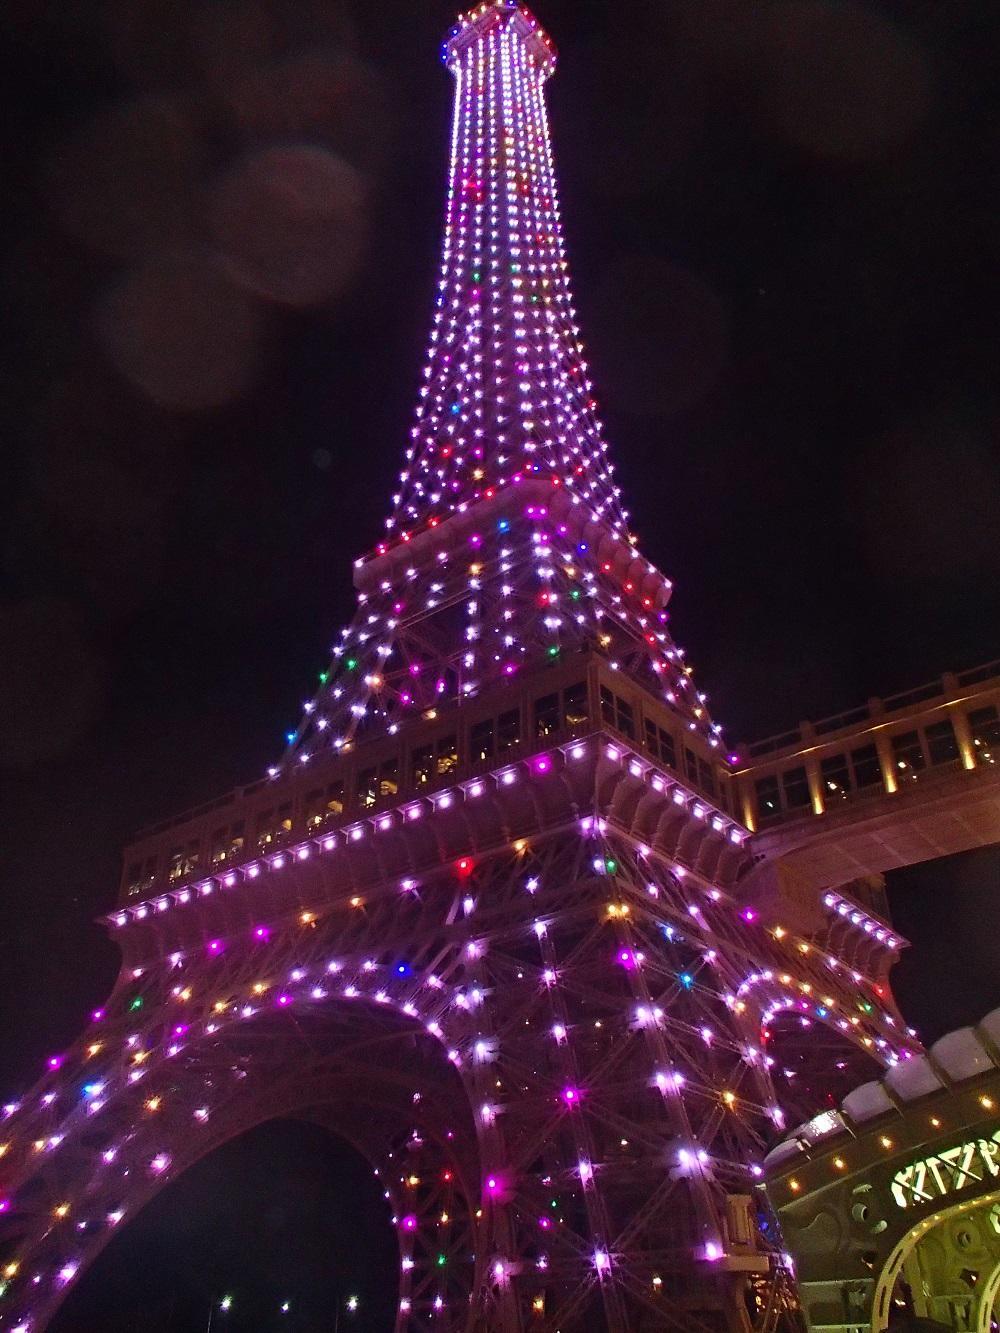 Eifell Tower pri The Parisian